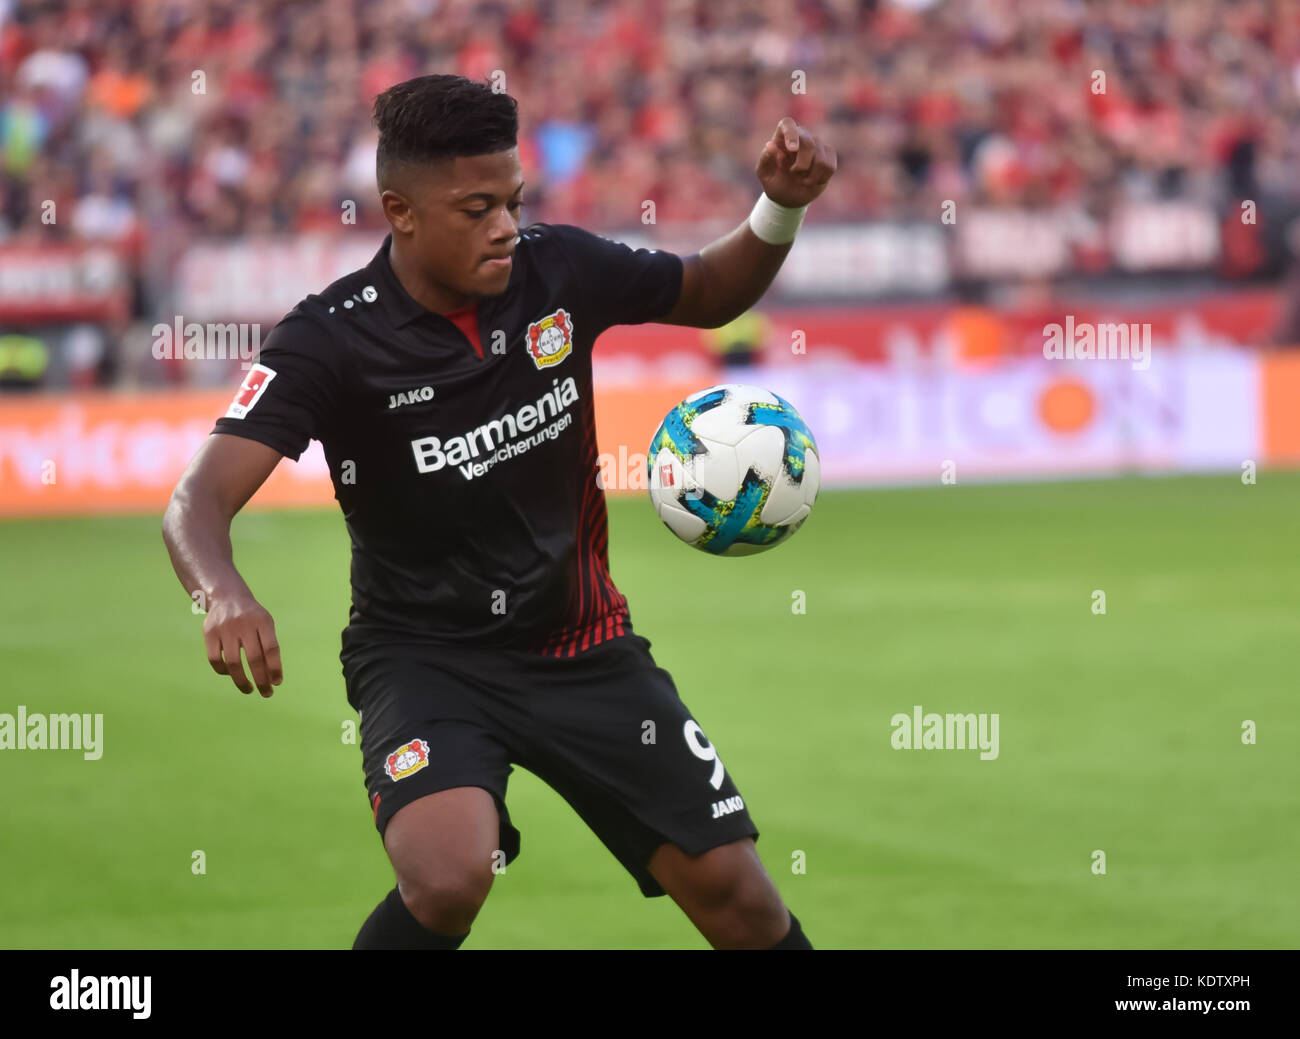 Leverkusen, Germany October 15 2017, Bundesliga matchday 9, Bayer 04 Leverkusen vs VFL Wolfsburg: Leon Bailey (B04) - Stock Image